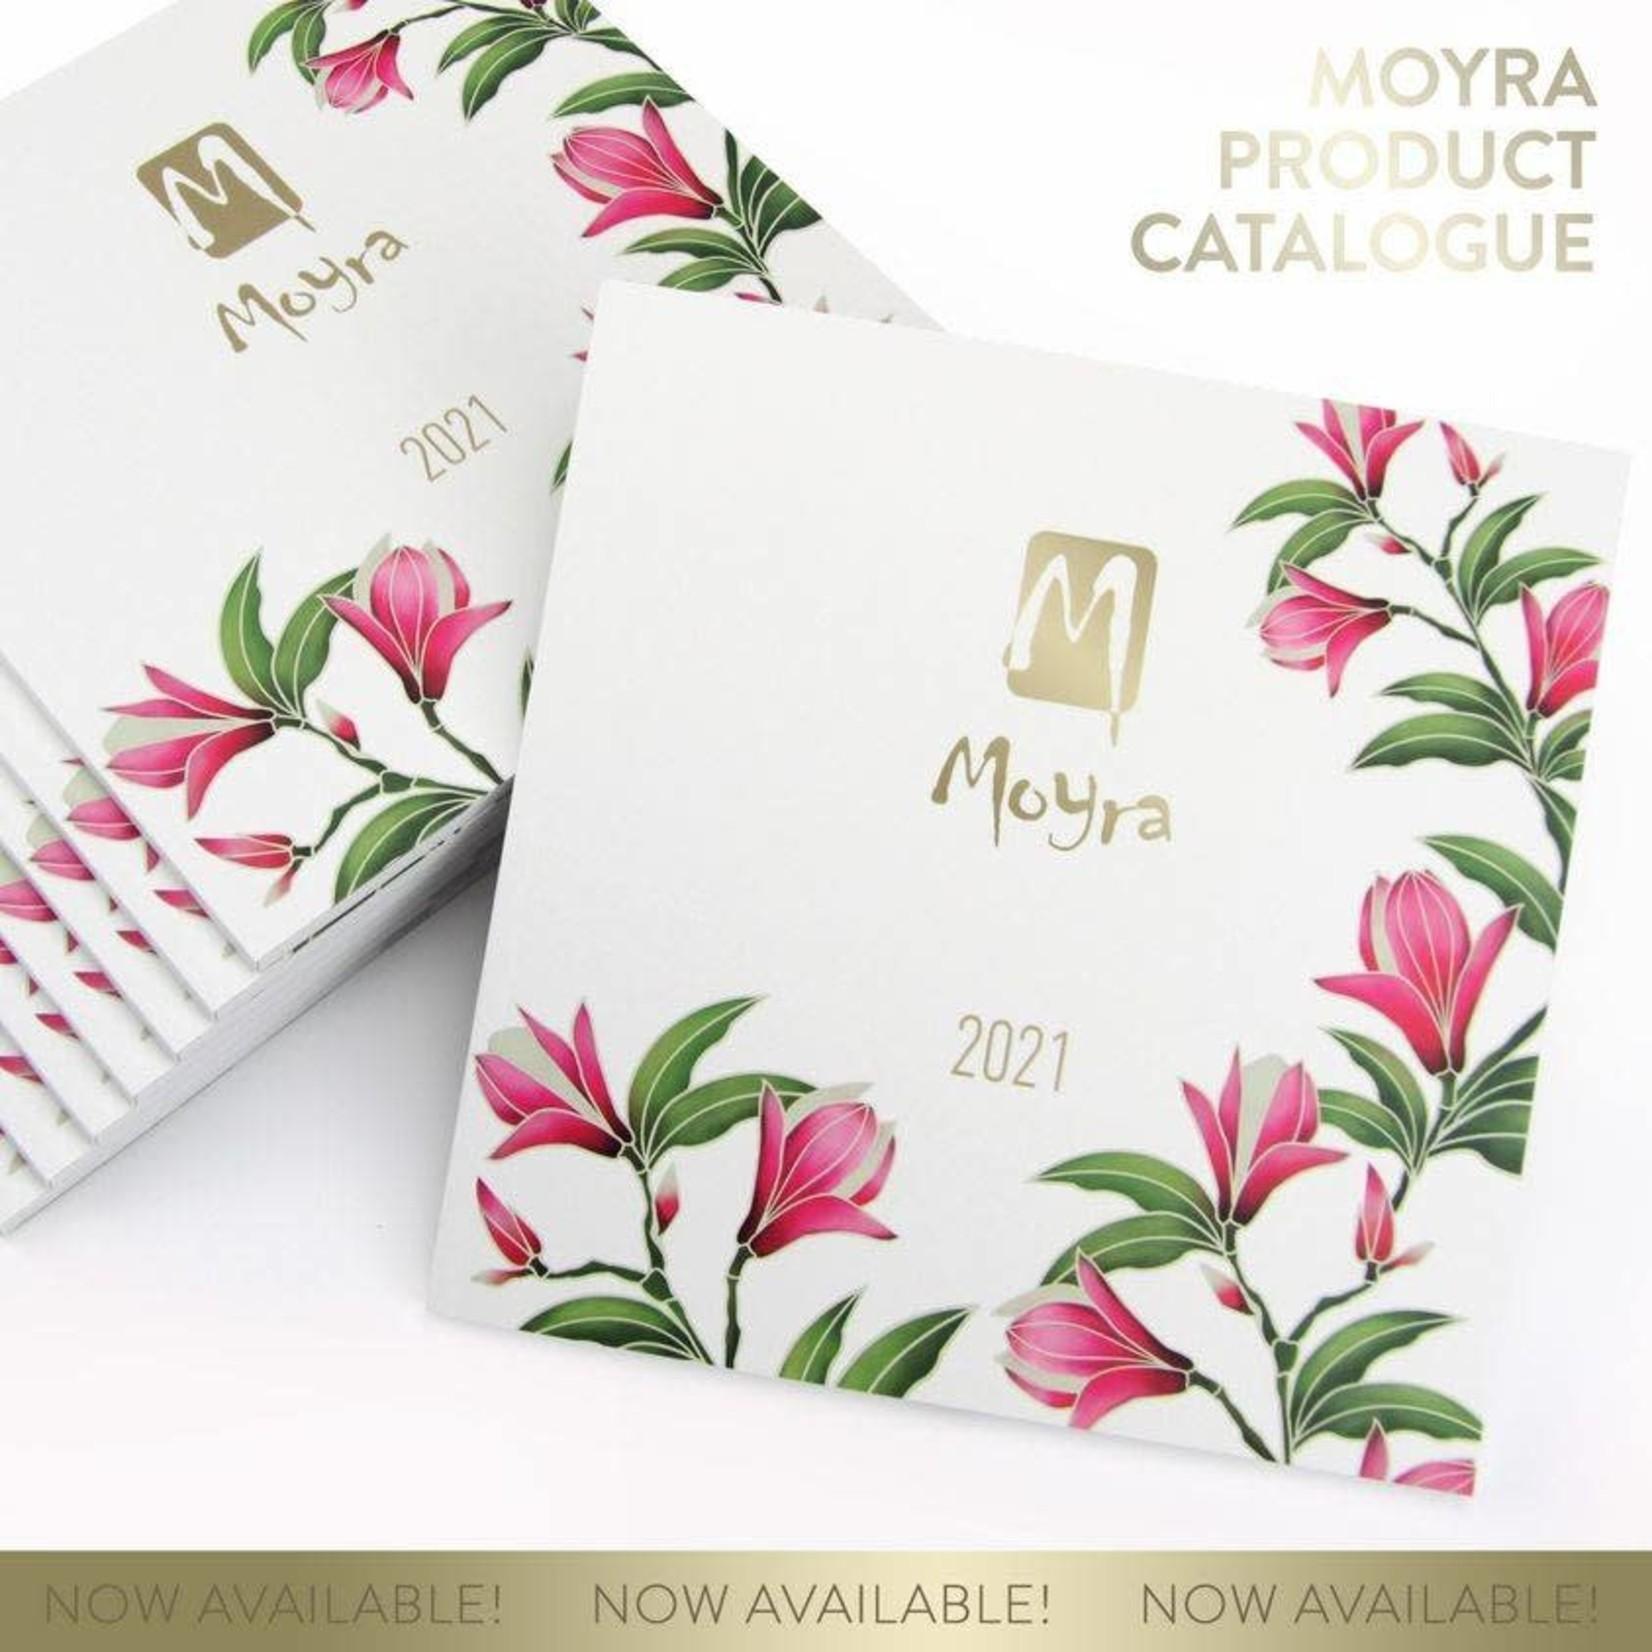 Moyra Moyra Product Catalogus 2021